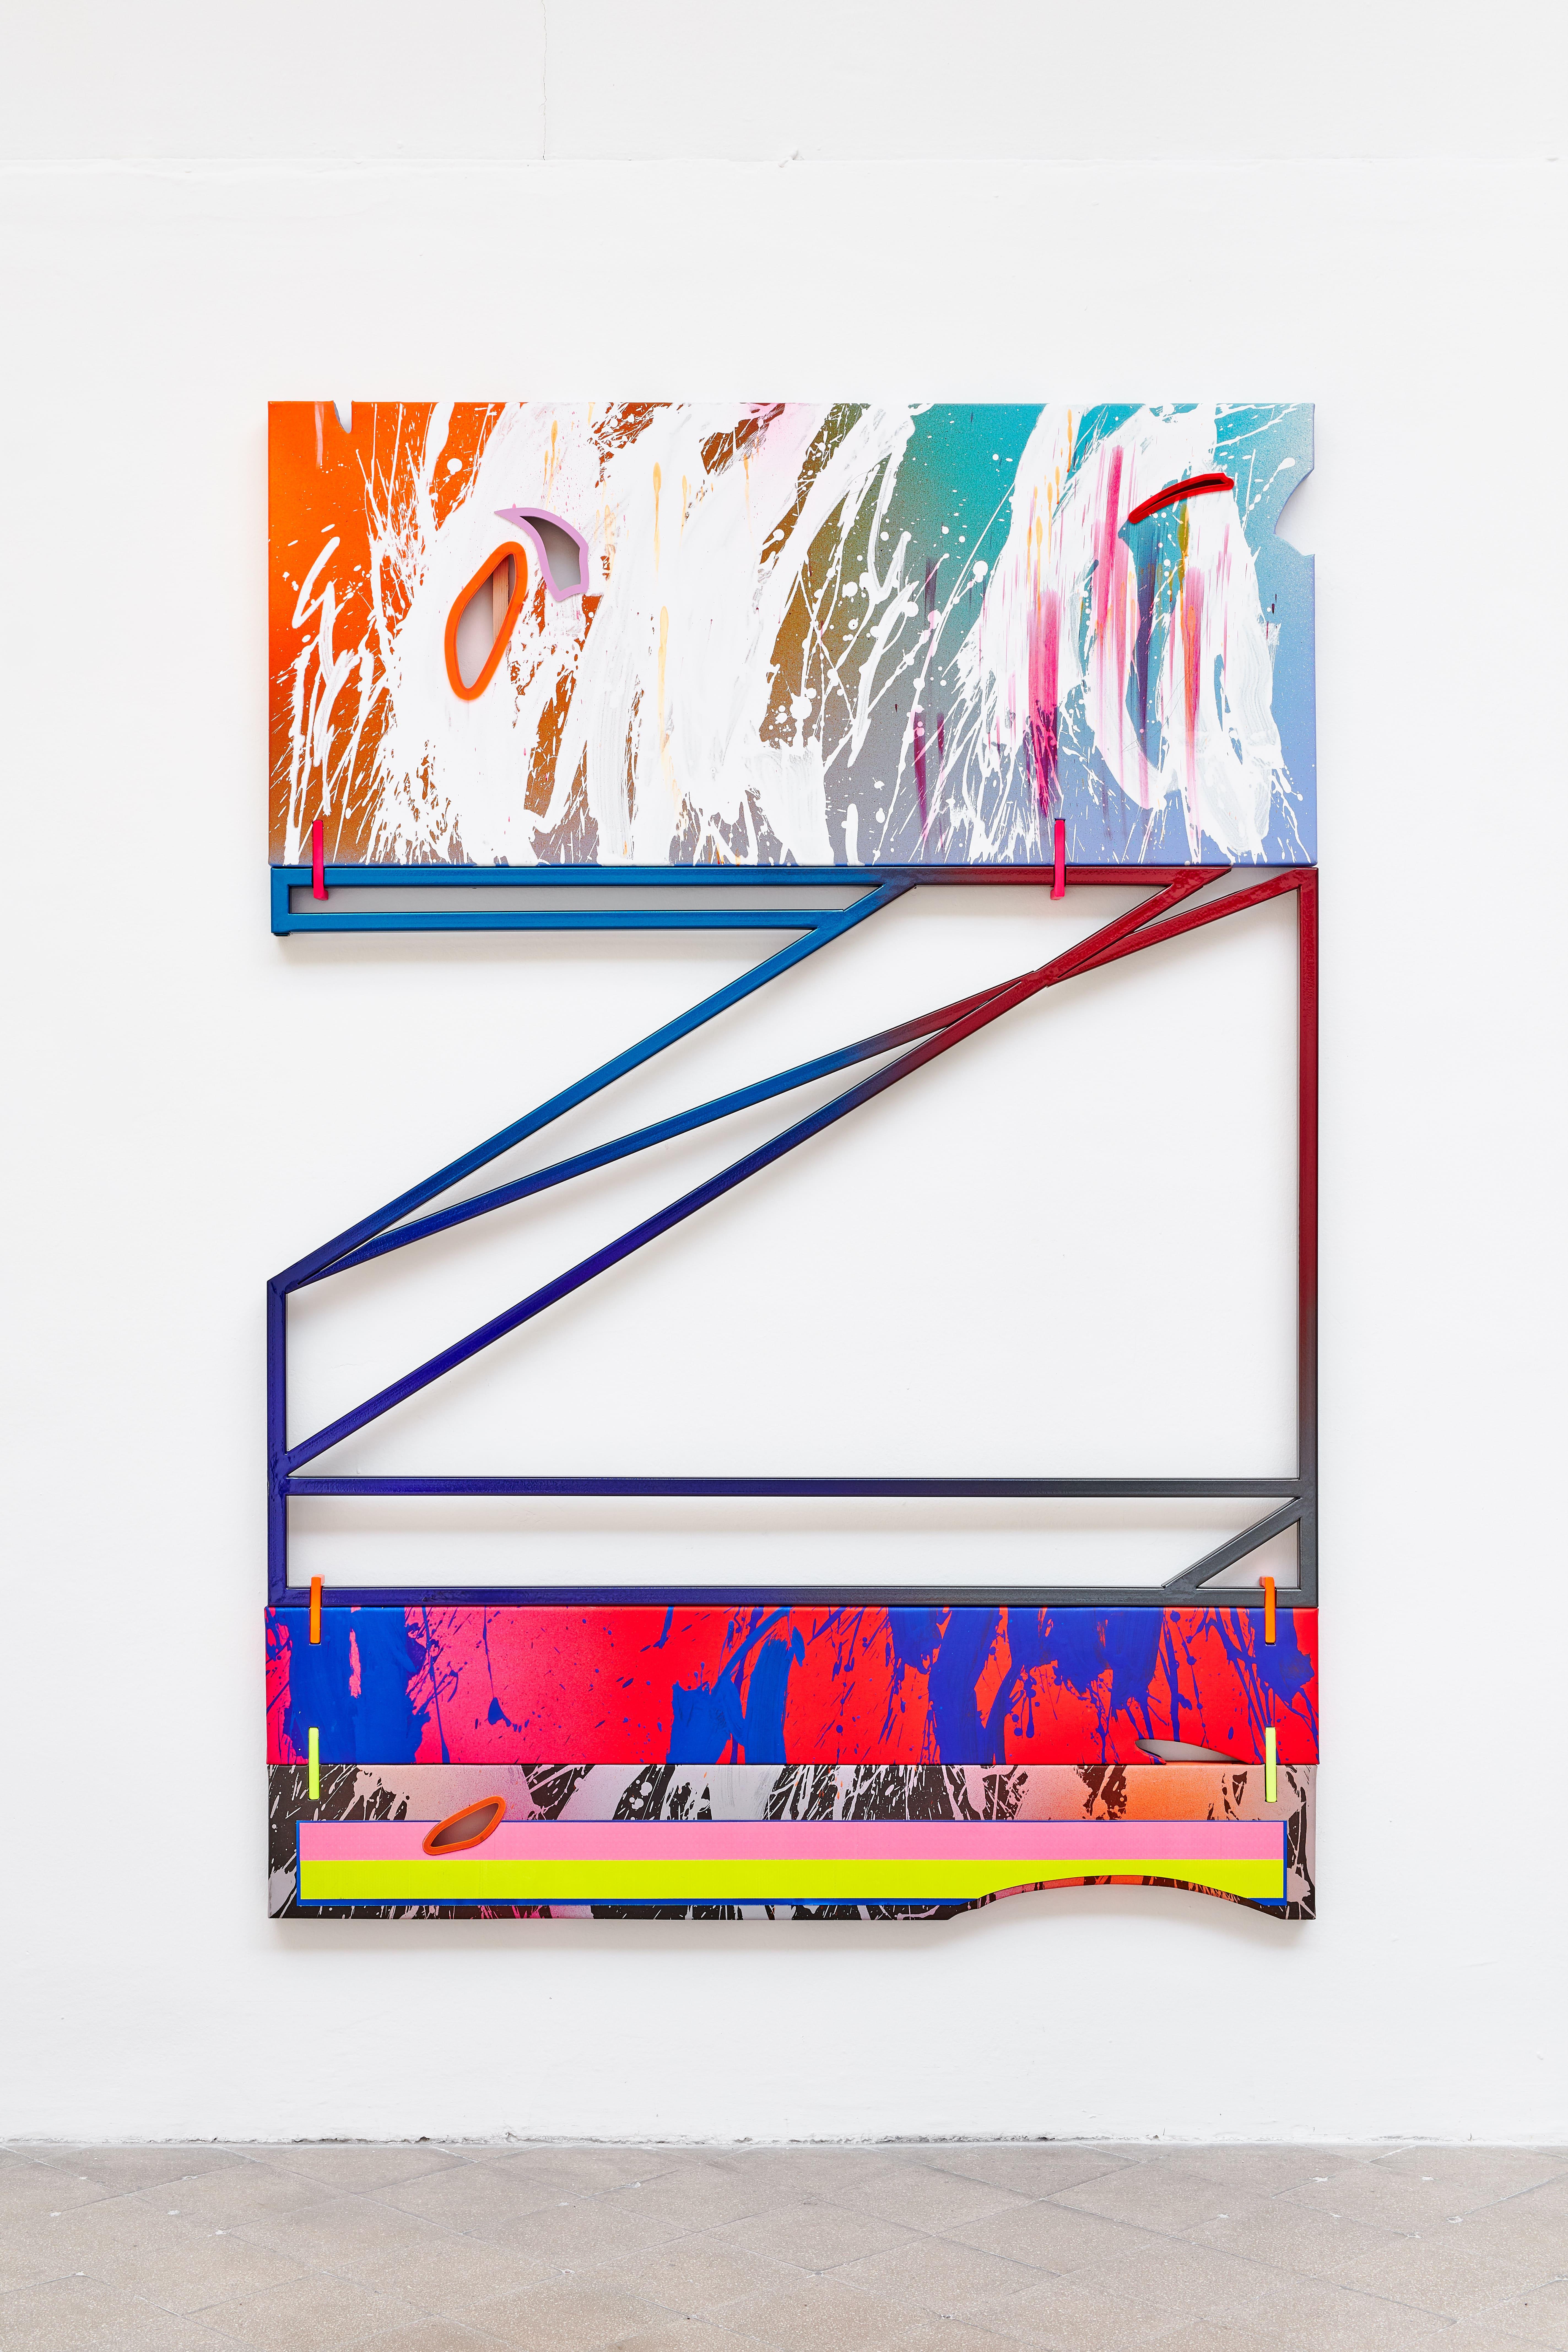 NemesM_Tomorrow-15_2019_196x136cm_steel-carpaint-lasercut-perspex-light-reflective-vinyl-mirror-paper-acrylic-canvas-wood-min